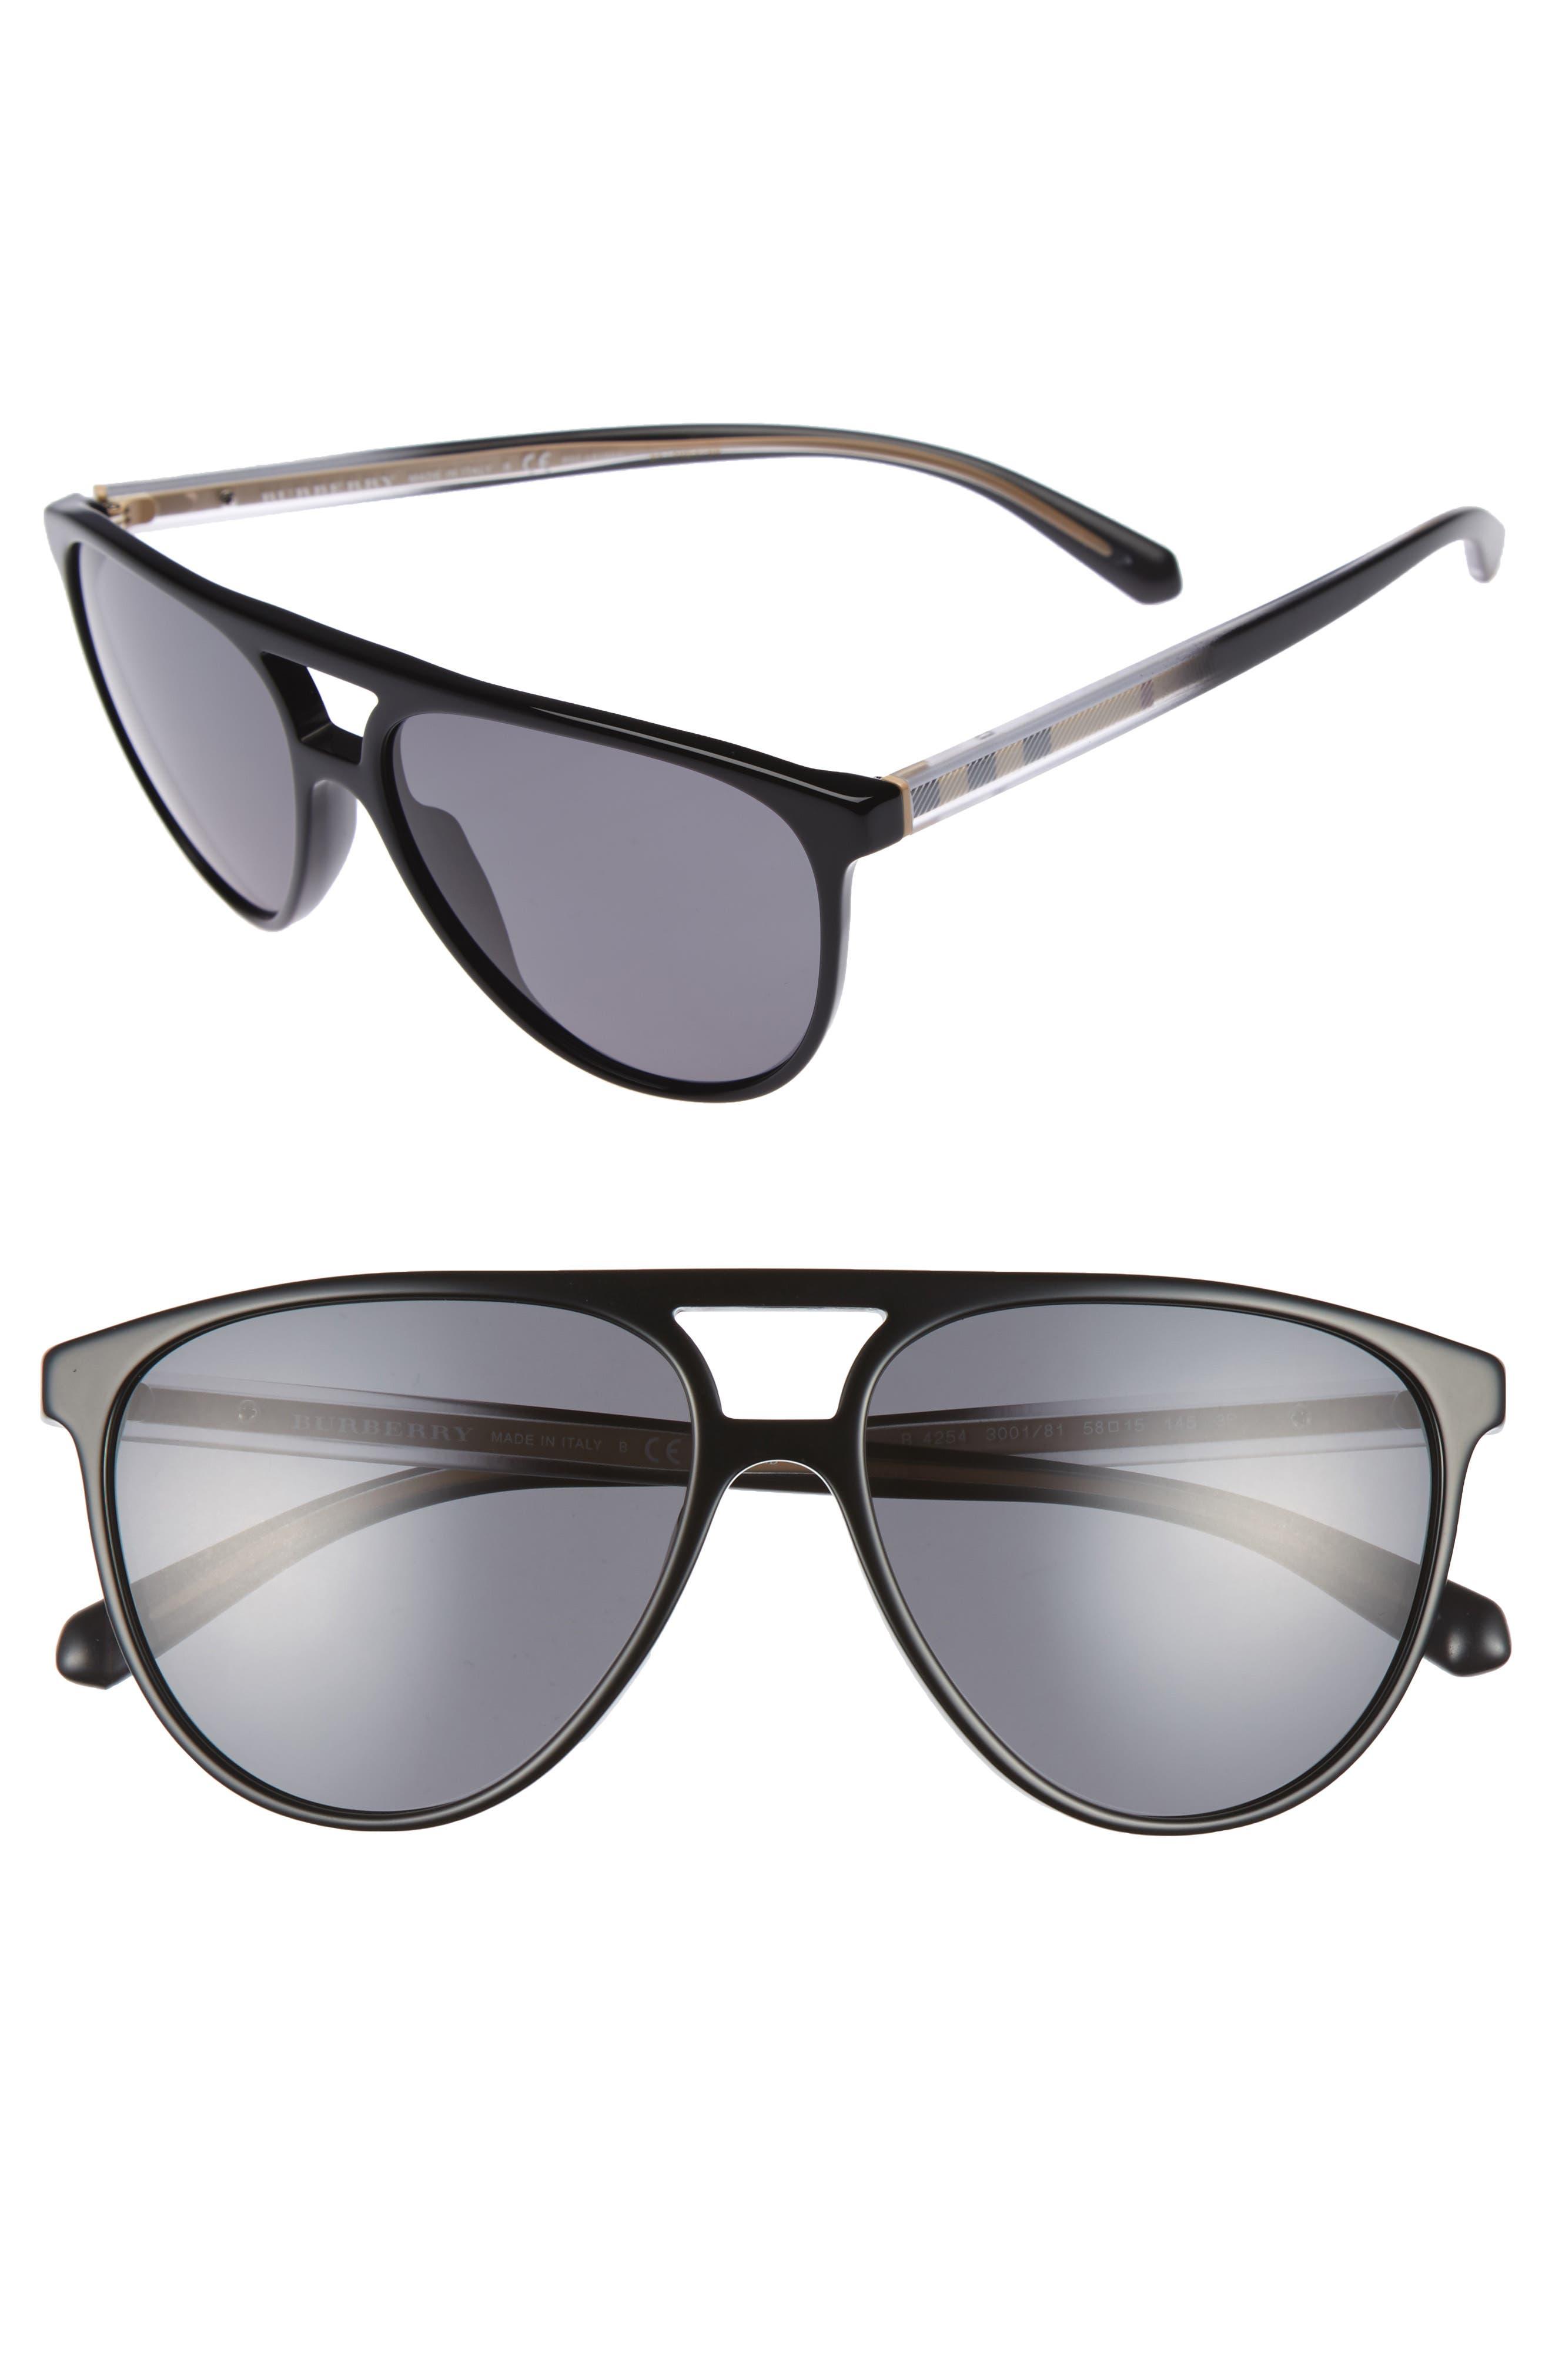 58mm Polarized Aviator Sunglasses,                         Main,                         color, Black/ Polar